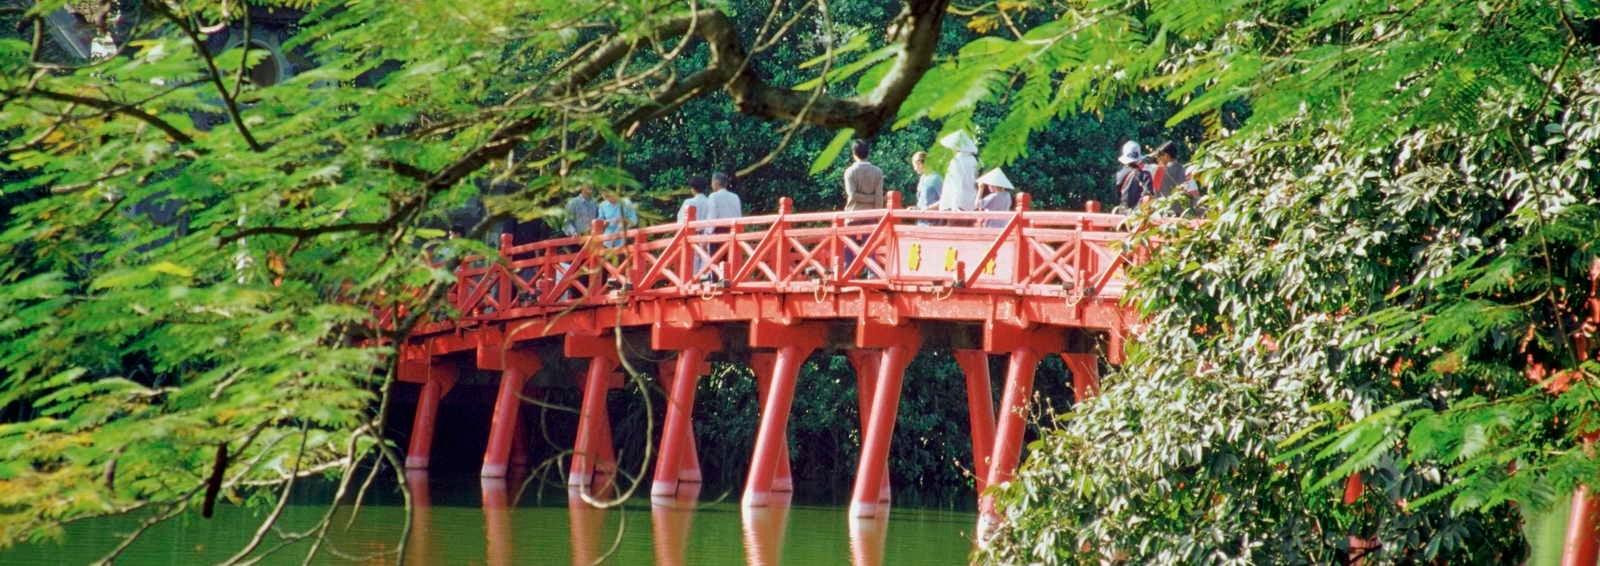 Haan Kiem Lake, Hanoi, Vietnam